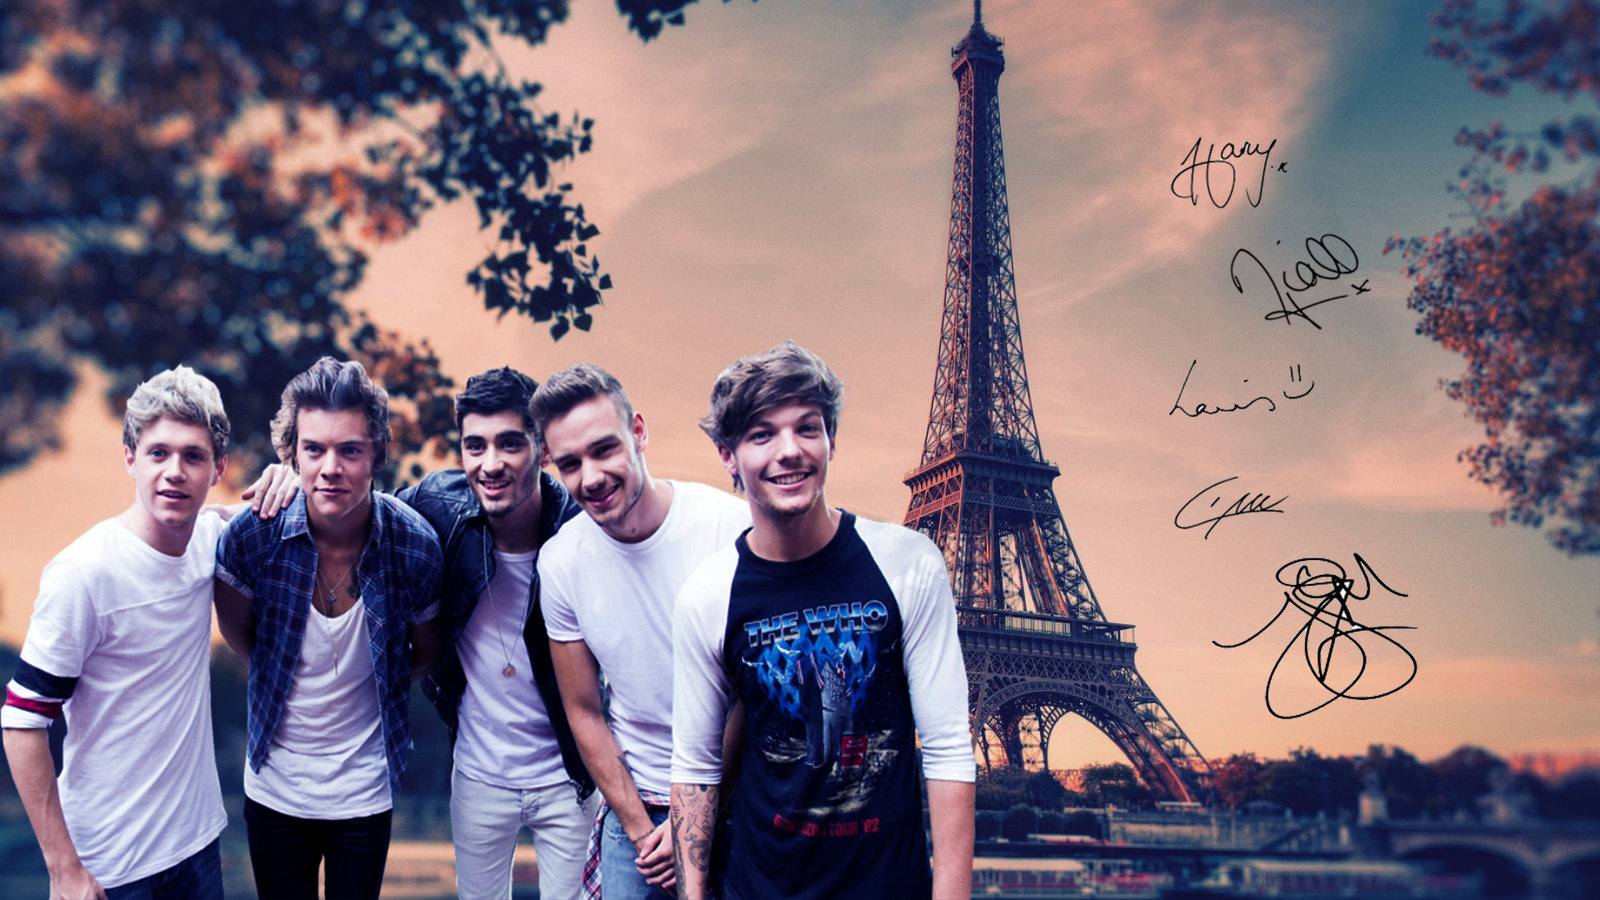 One Direction wallpaper by Madi Milkshakes 1600x900